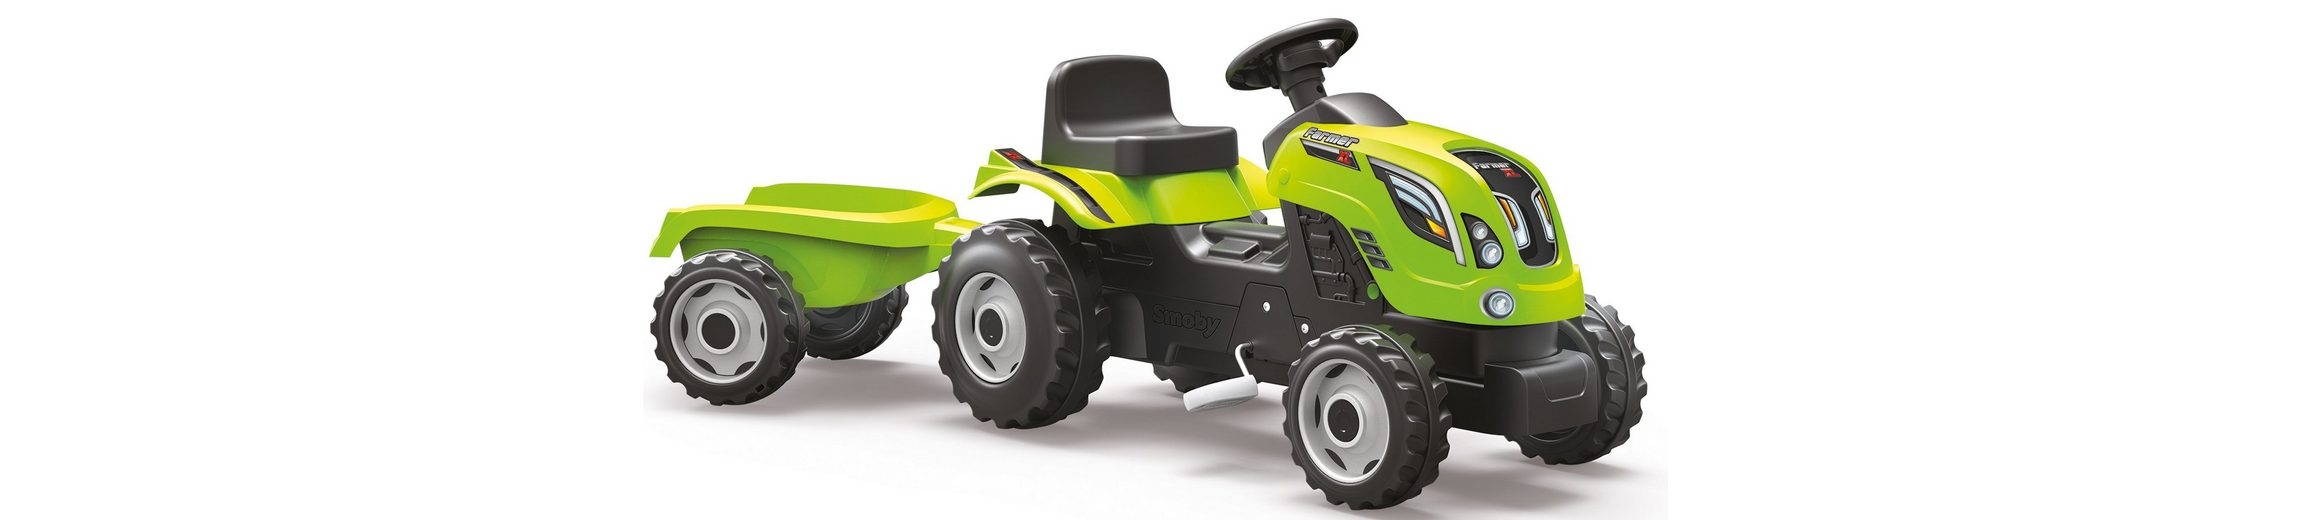 Smoby Trettraktor mit Anhänger, »Farmer XL, grün«